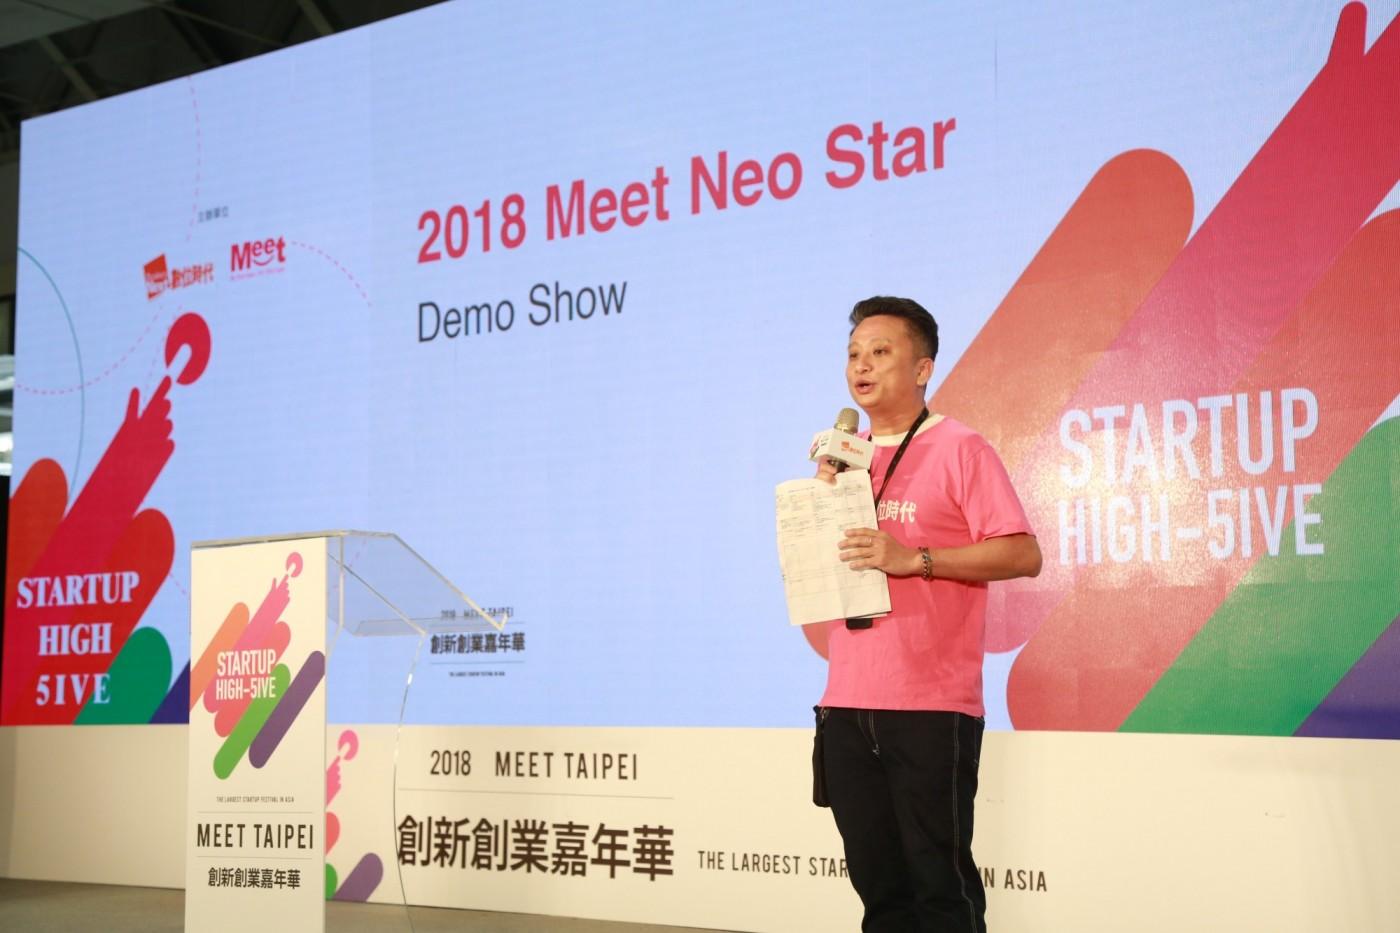 B2B商模崛起!2019 Meet Neo Star 30強揭曉:AI新創來勢洶洶,迎接智慧醫療新高峰